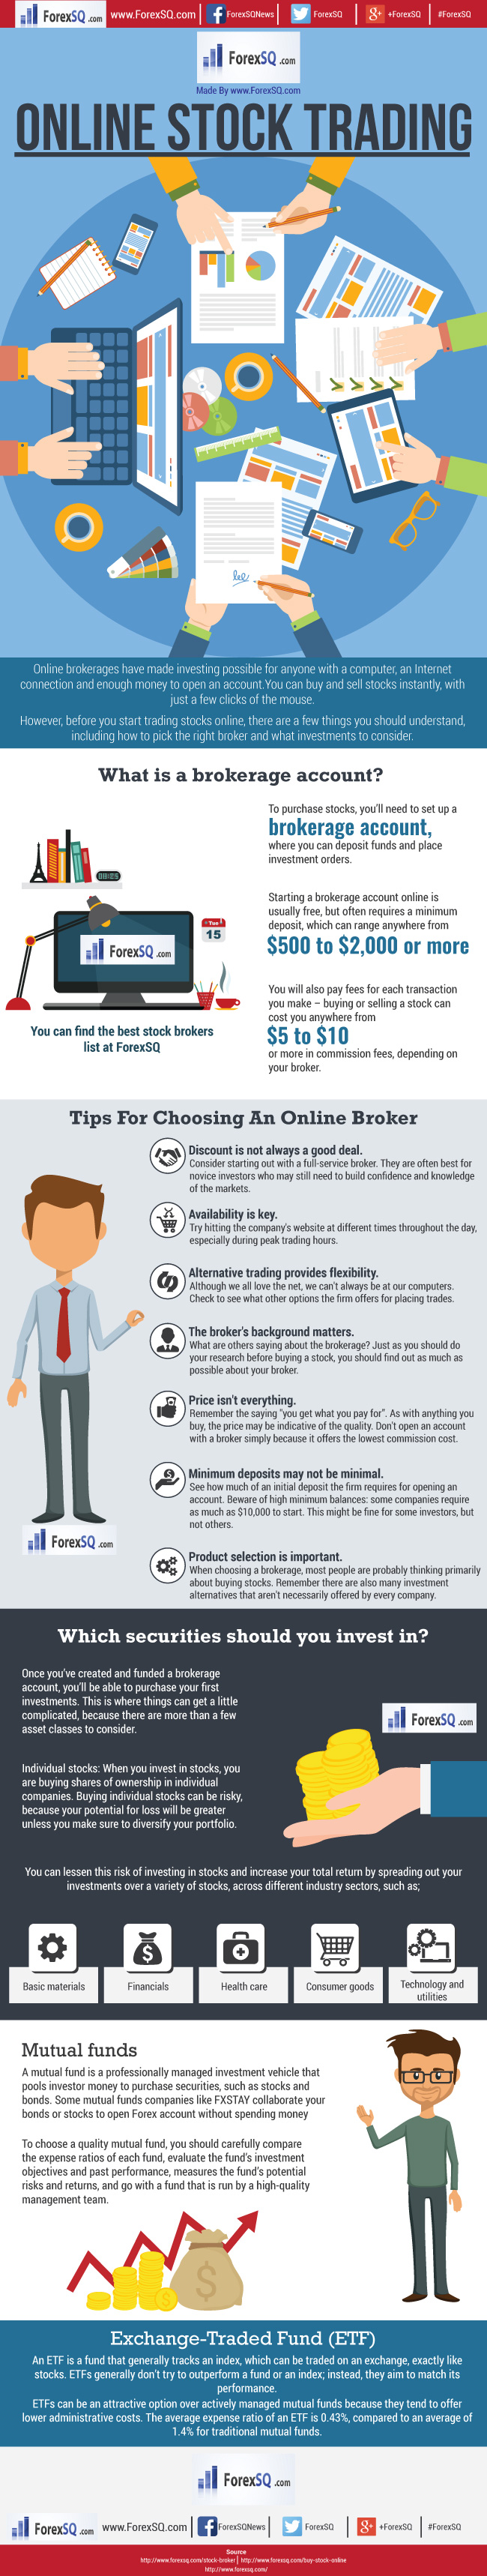 Buy stocks, buy stocks online, buying stocks, stock trading, online stock trading, purchase stock, how to buy stocks online